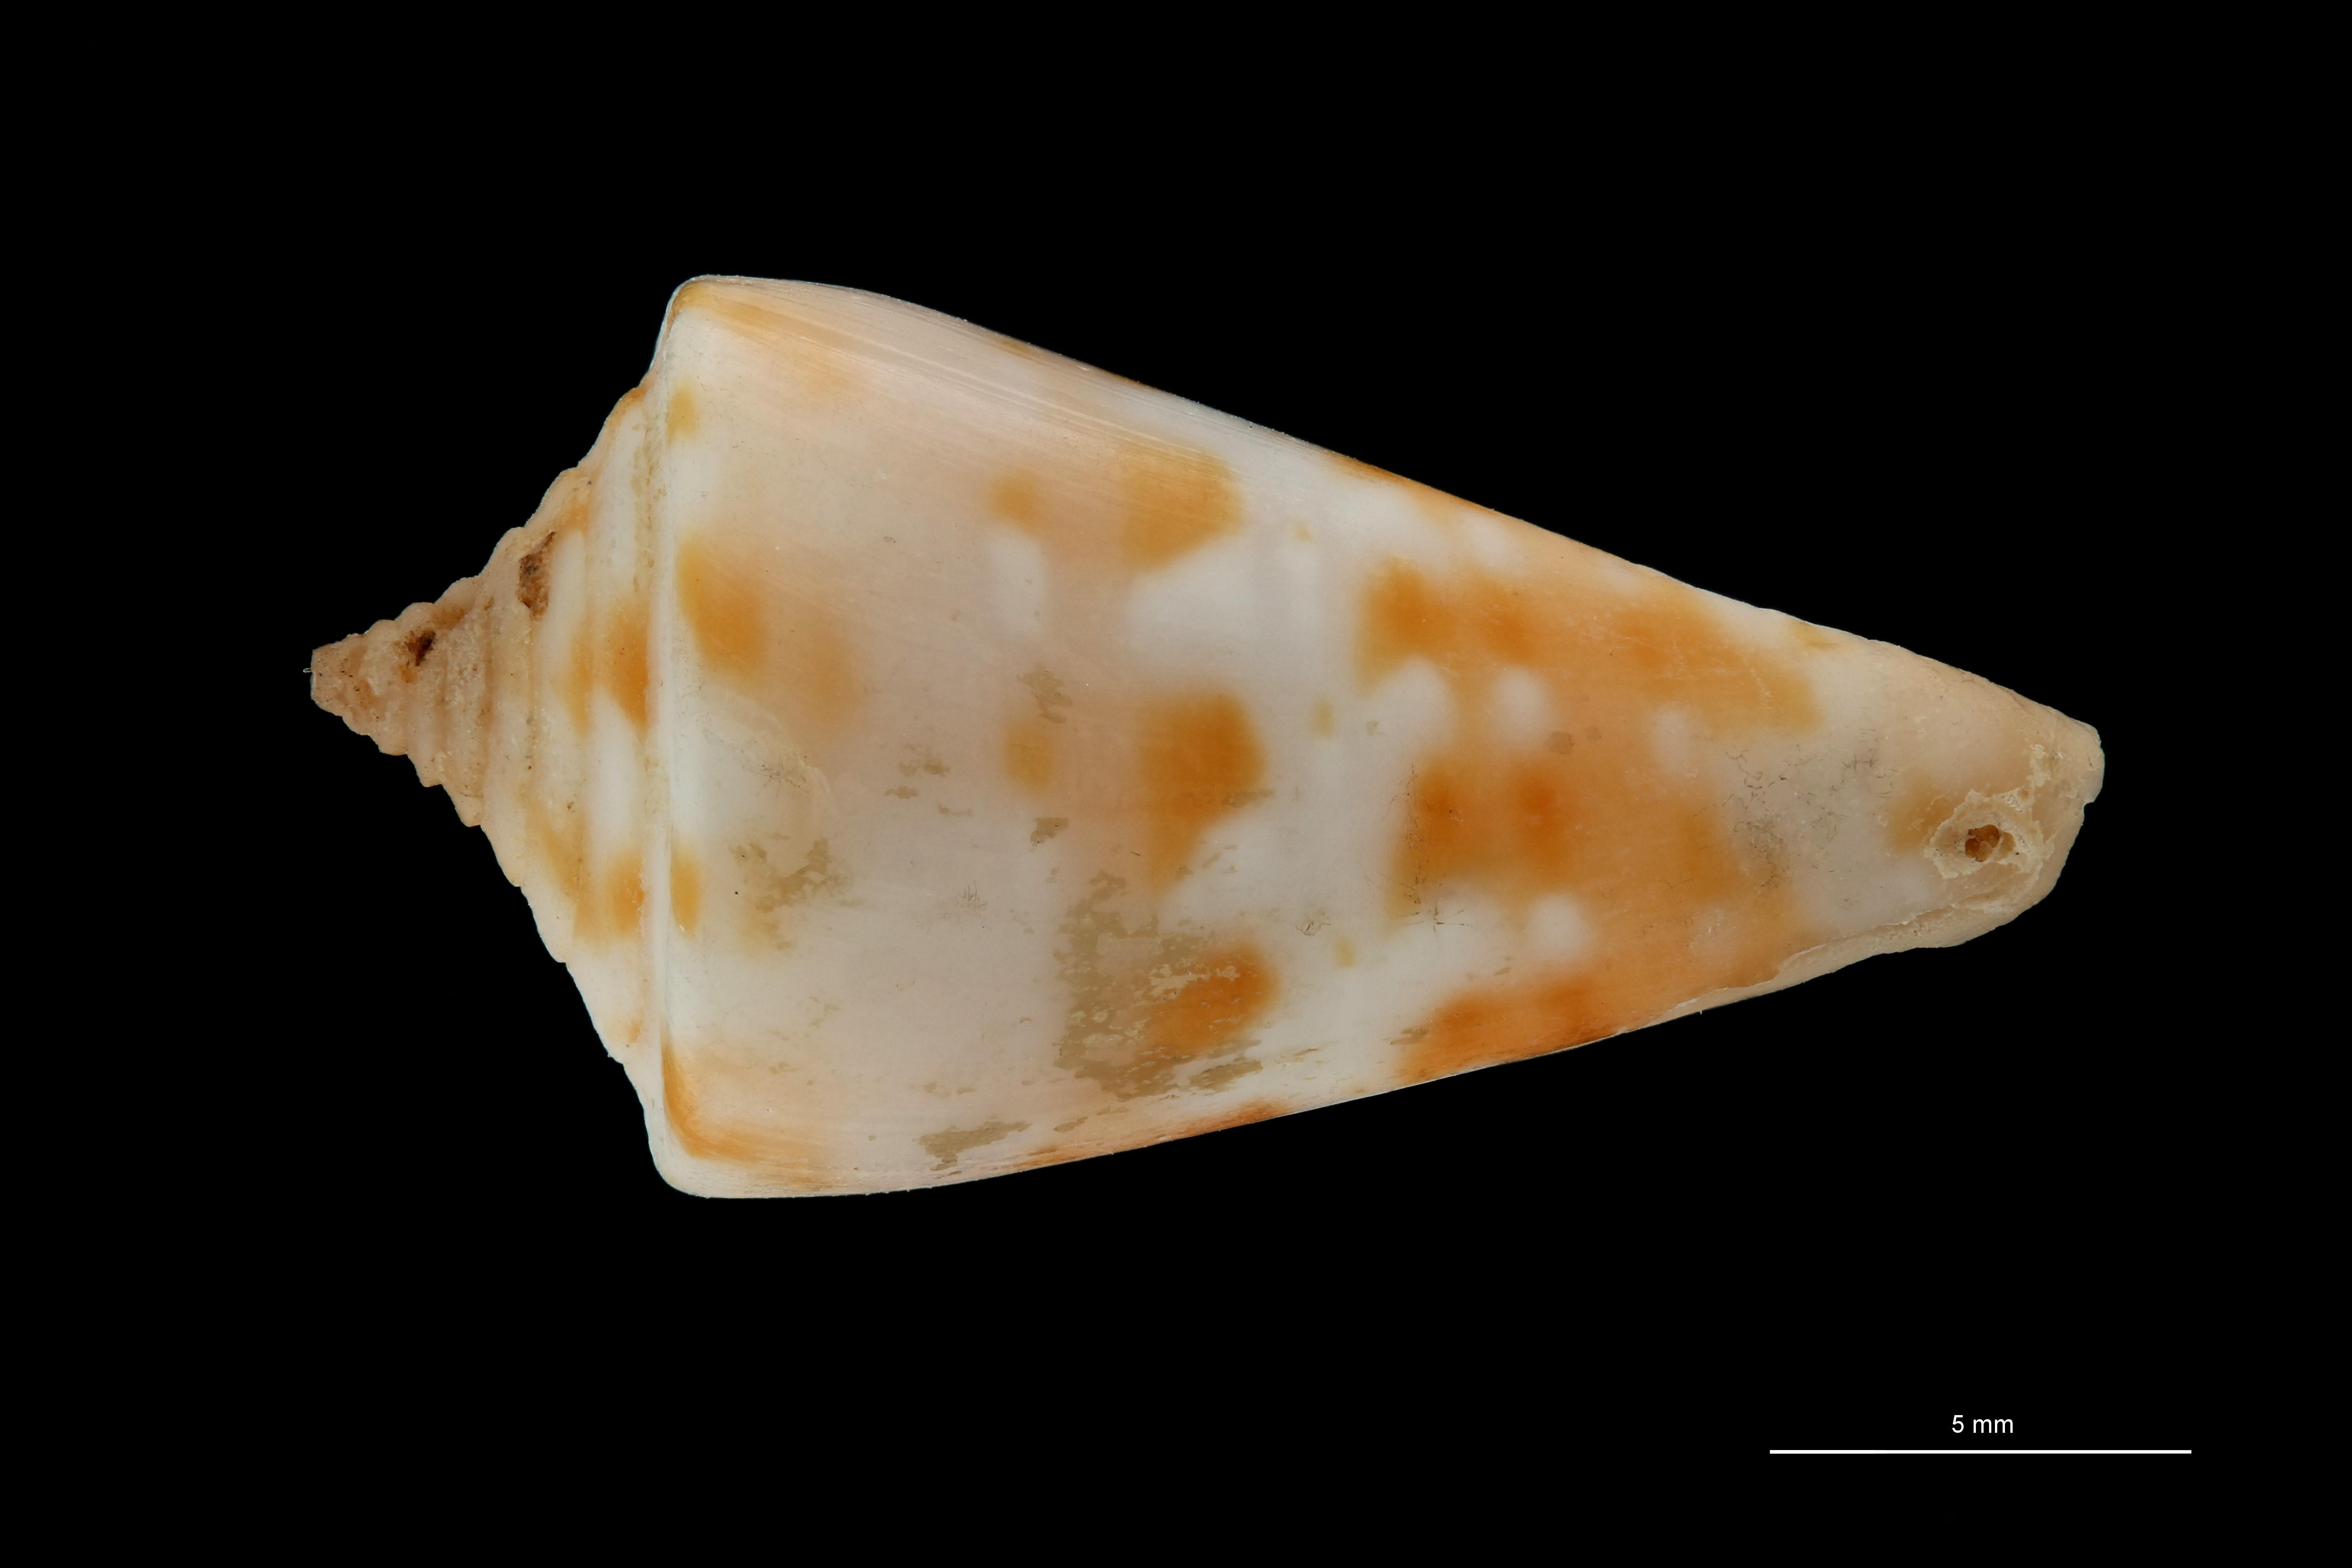 BE-RBINS-INV PARATYPE MT 380 Conus (Sandericonus) sanderi DORSAL ZS PMax Scaled.jpg